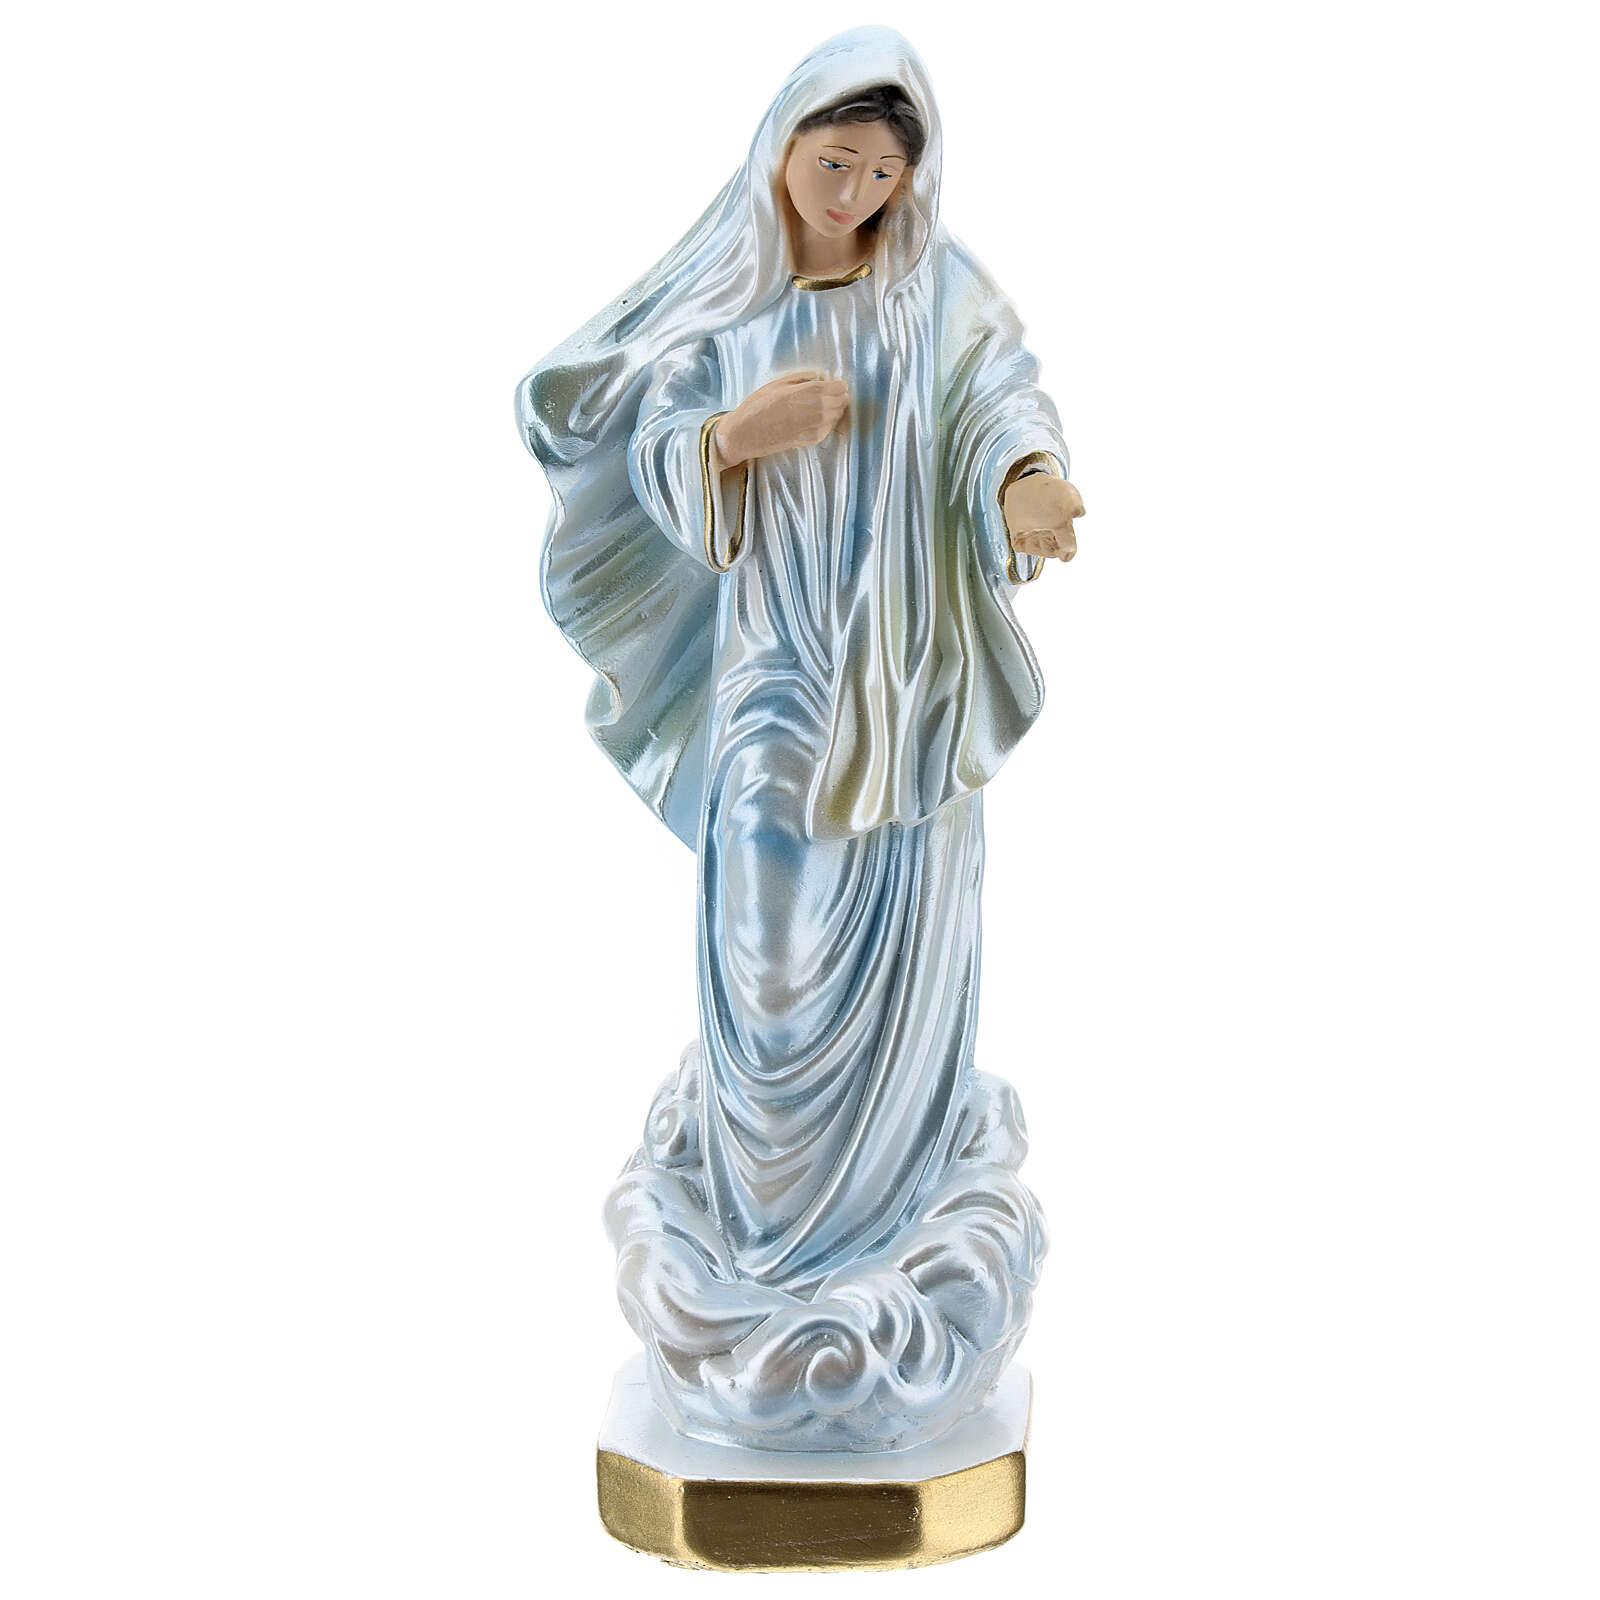 Statua gesso madreperlato Madonna di Medjugorje 20 cm 4